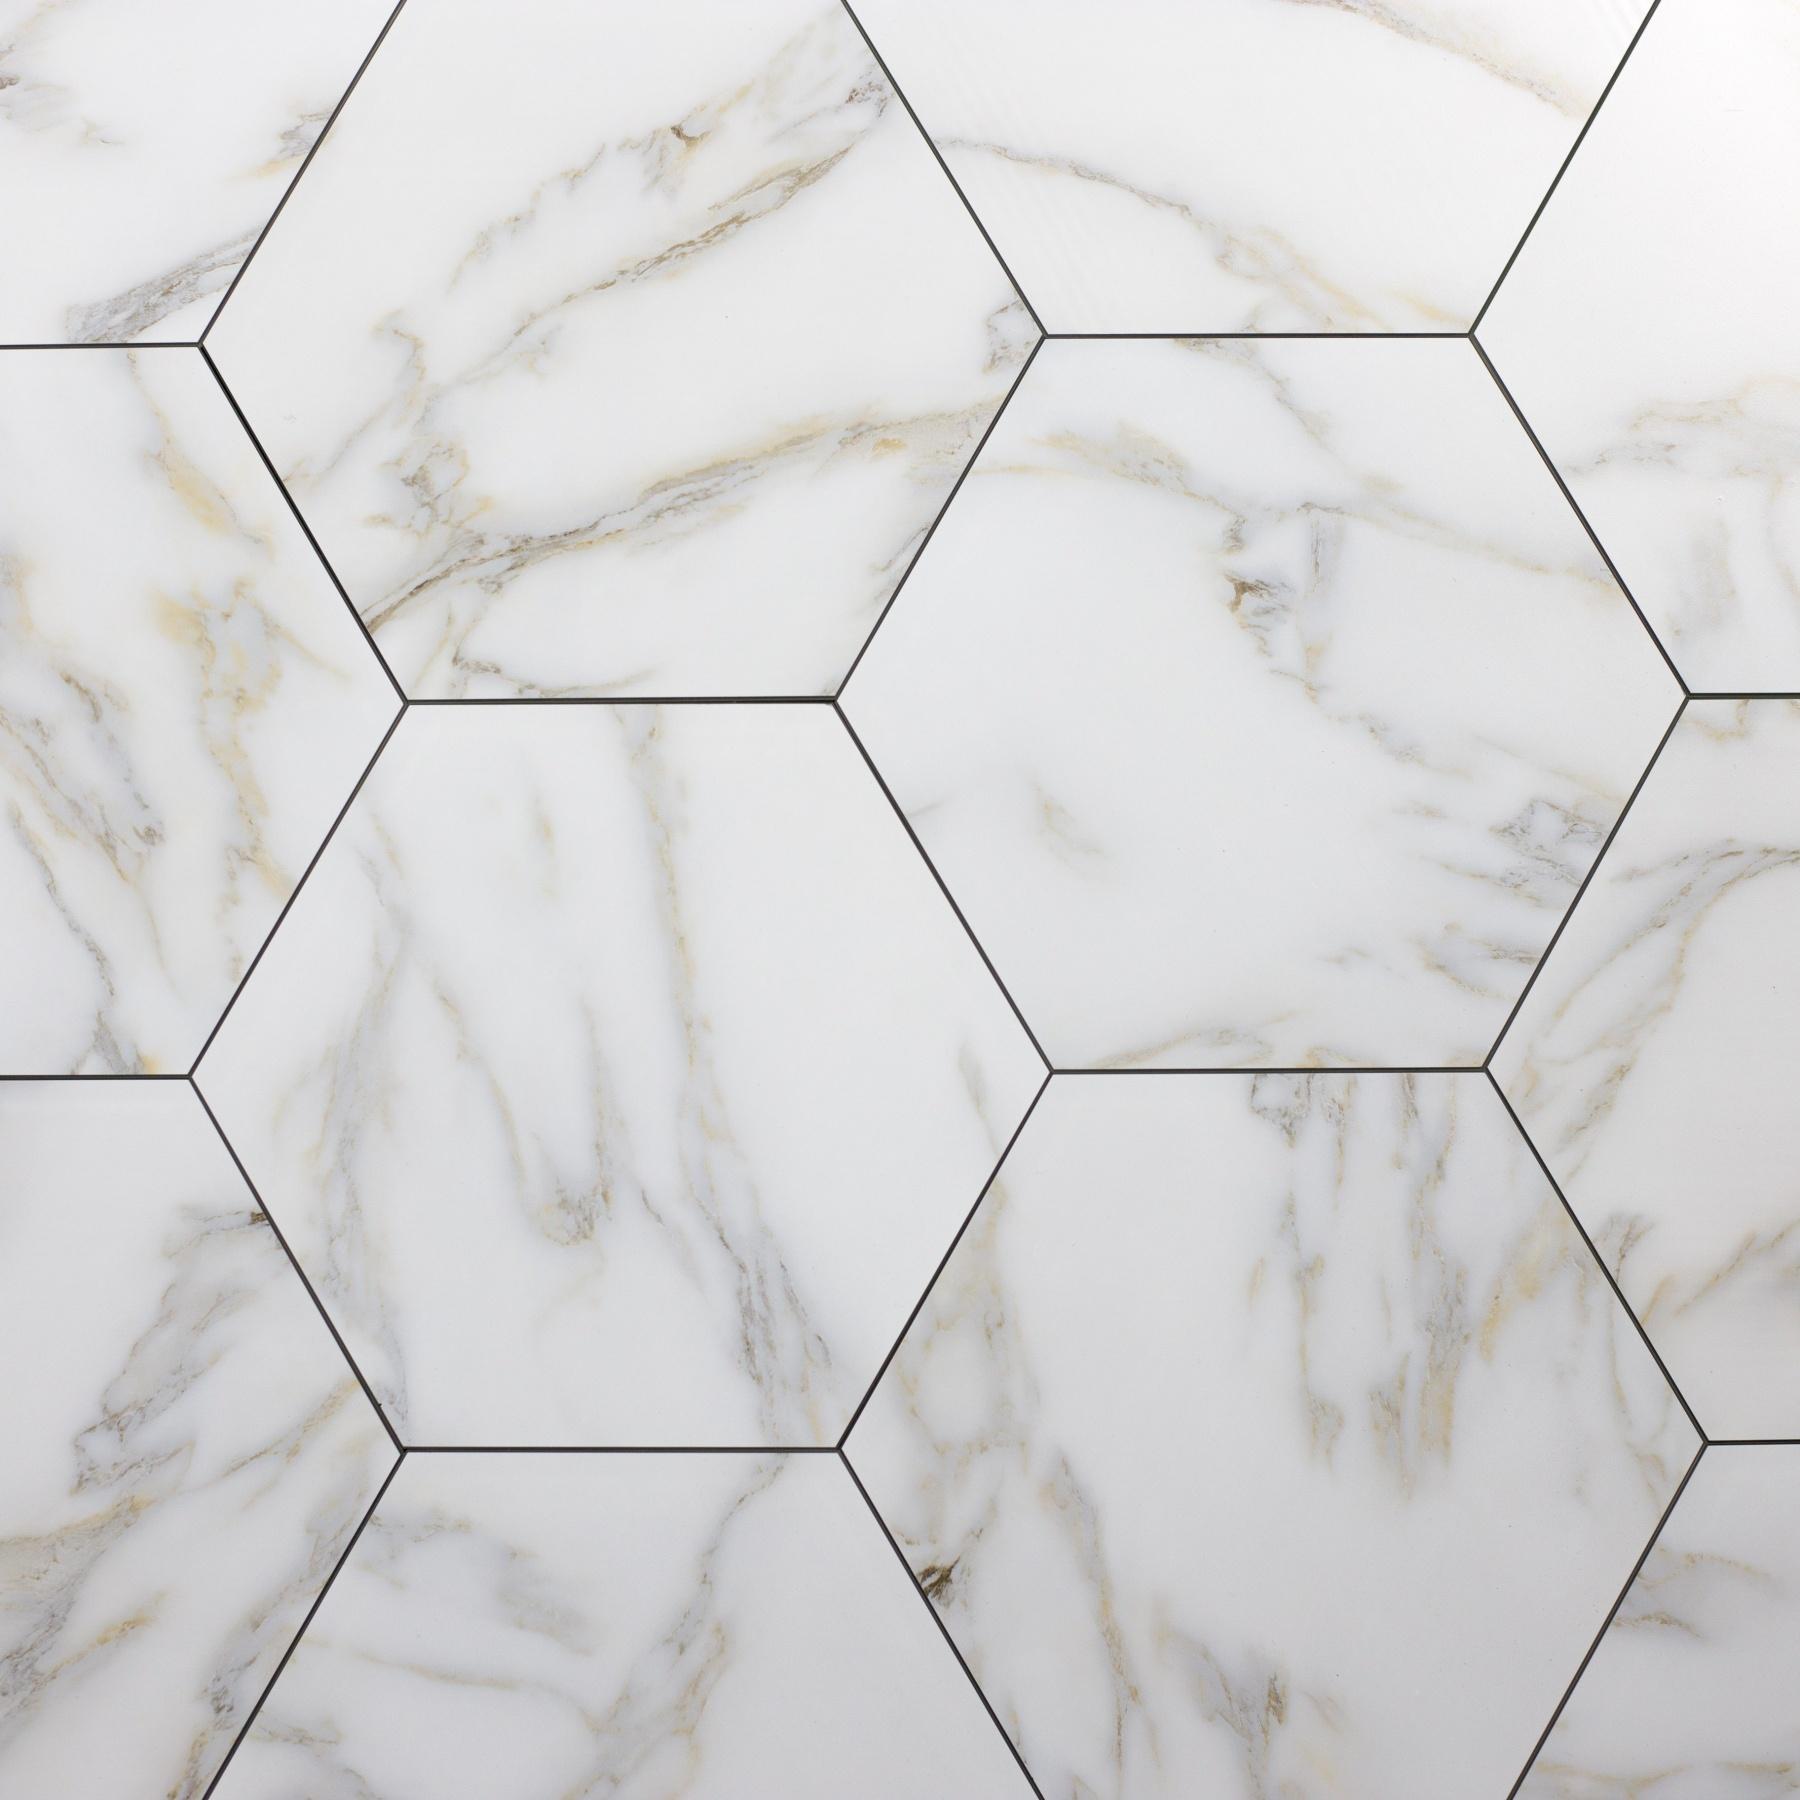 Nature 8 in x 8 in Glass Hexagon Tile in CALACATTA GOLD Matte